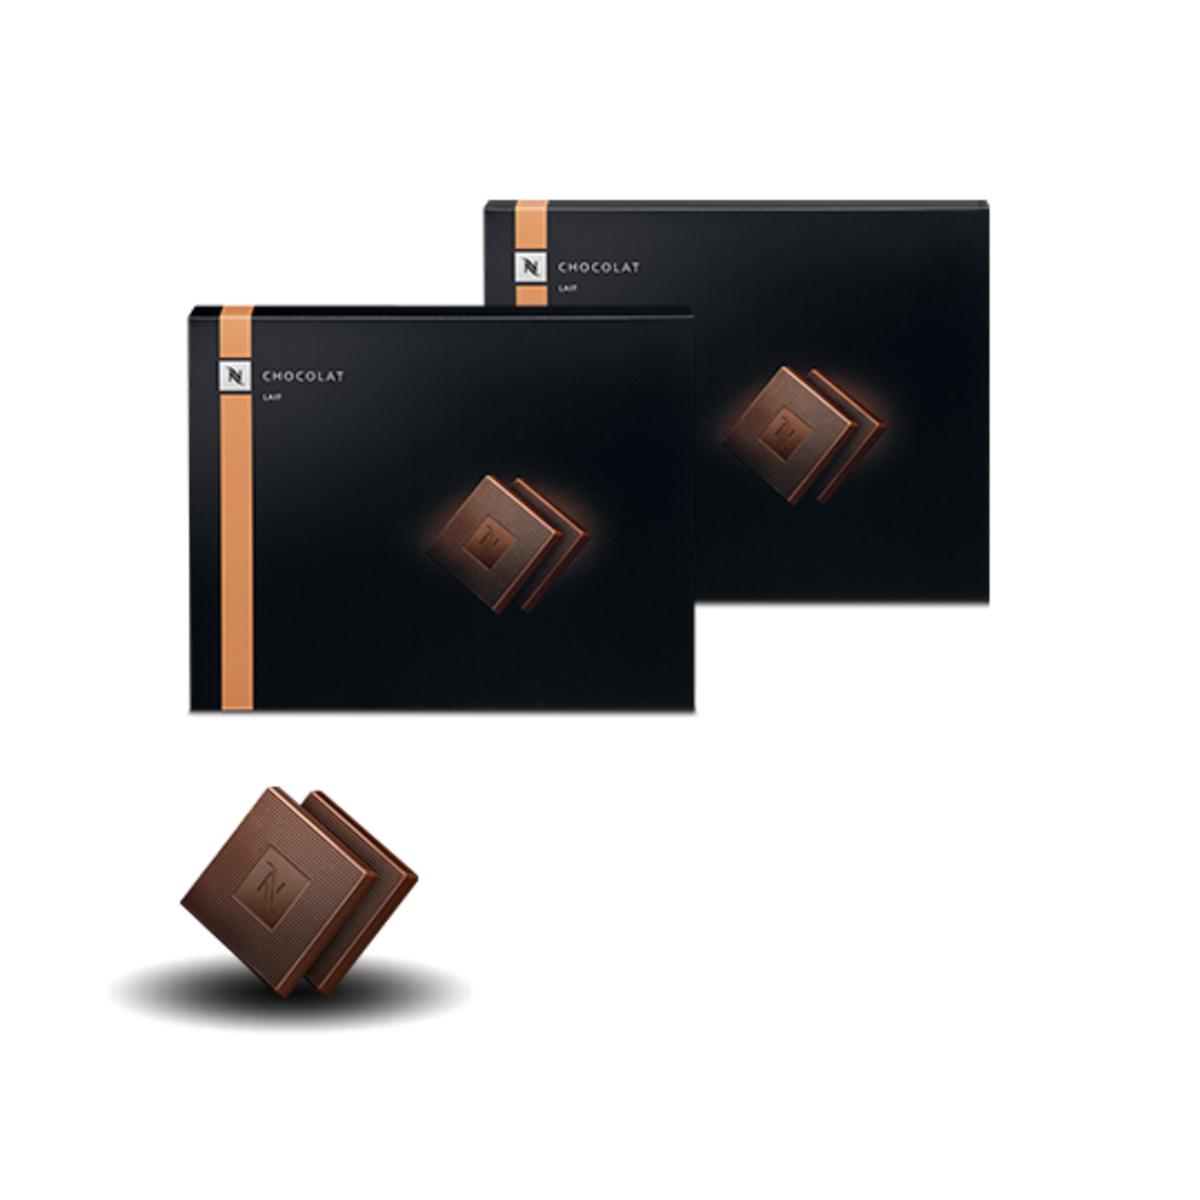 Nespresso Milk Chocolate шоколовадови блокчета